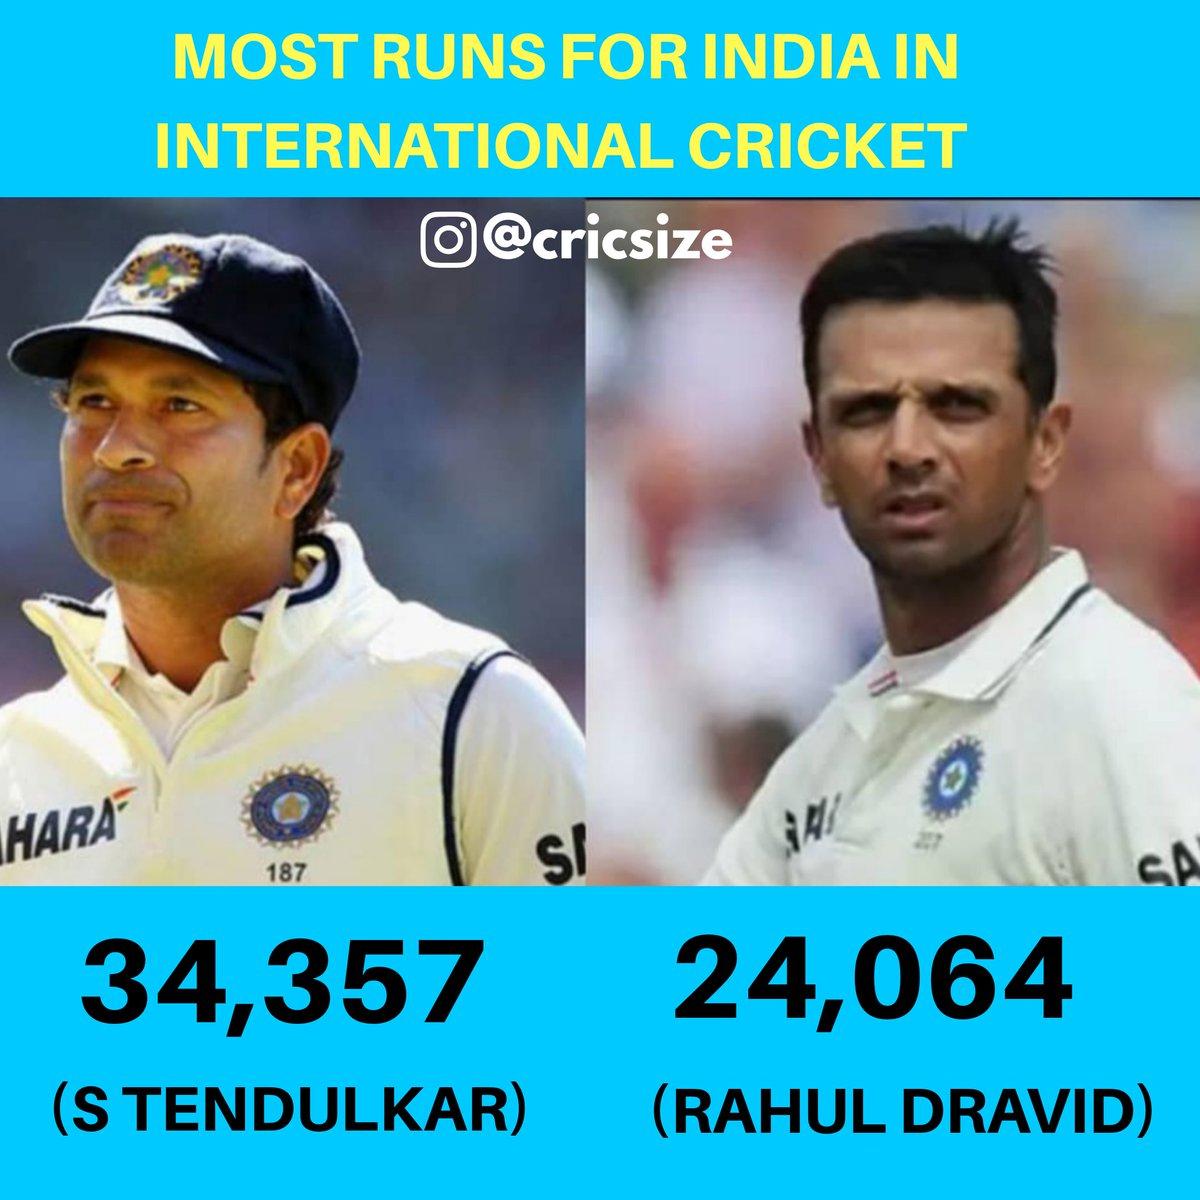 Sachin Tendulkar has Scored Most Runs for India in International Cricket  #cricket #sachintendulkar #rahuldravid #indiancricket #Indiancricketer #indiancricketteam #MostRunsForIndia #virat #rohit #rohitians #runmachine #kingkohli #msdians  #cricketers #stevesmith #davidwarner<br>http://pic.twitter.com/lHlT2chgv0